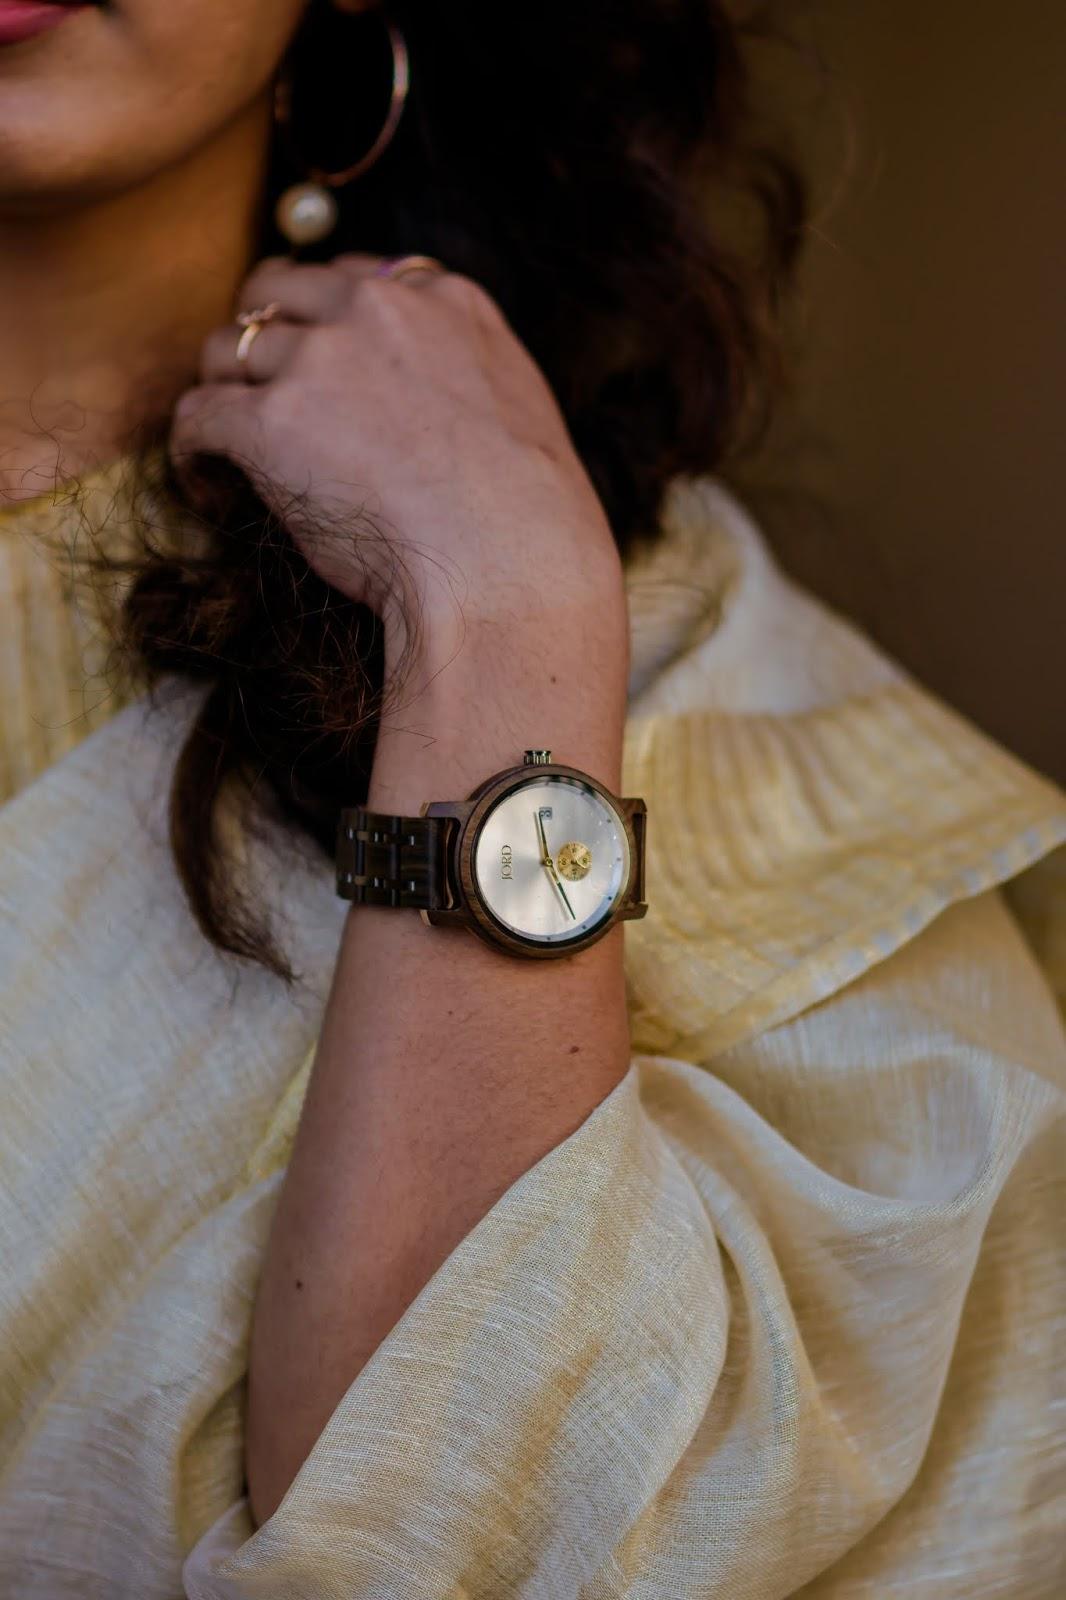 Saree, Aim For Glam, Wardrobe Essentials, Jord Watches, Perls, South Indian Fashion, Indian Fashion Blogger, Gold Tissue Saree, Le Svana, Prasanthi Kadiyala, Vizag Blogger, Hyderabad Fashion Blogger, Denver Blogger